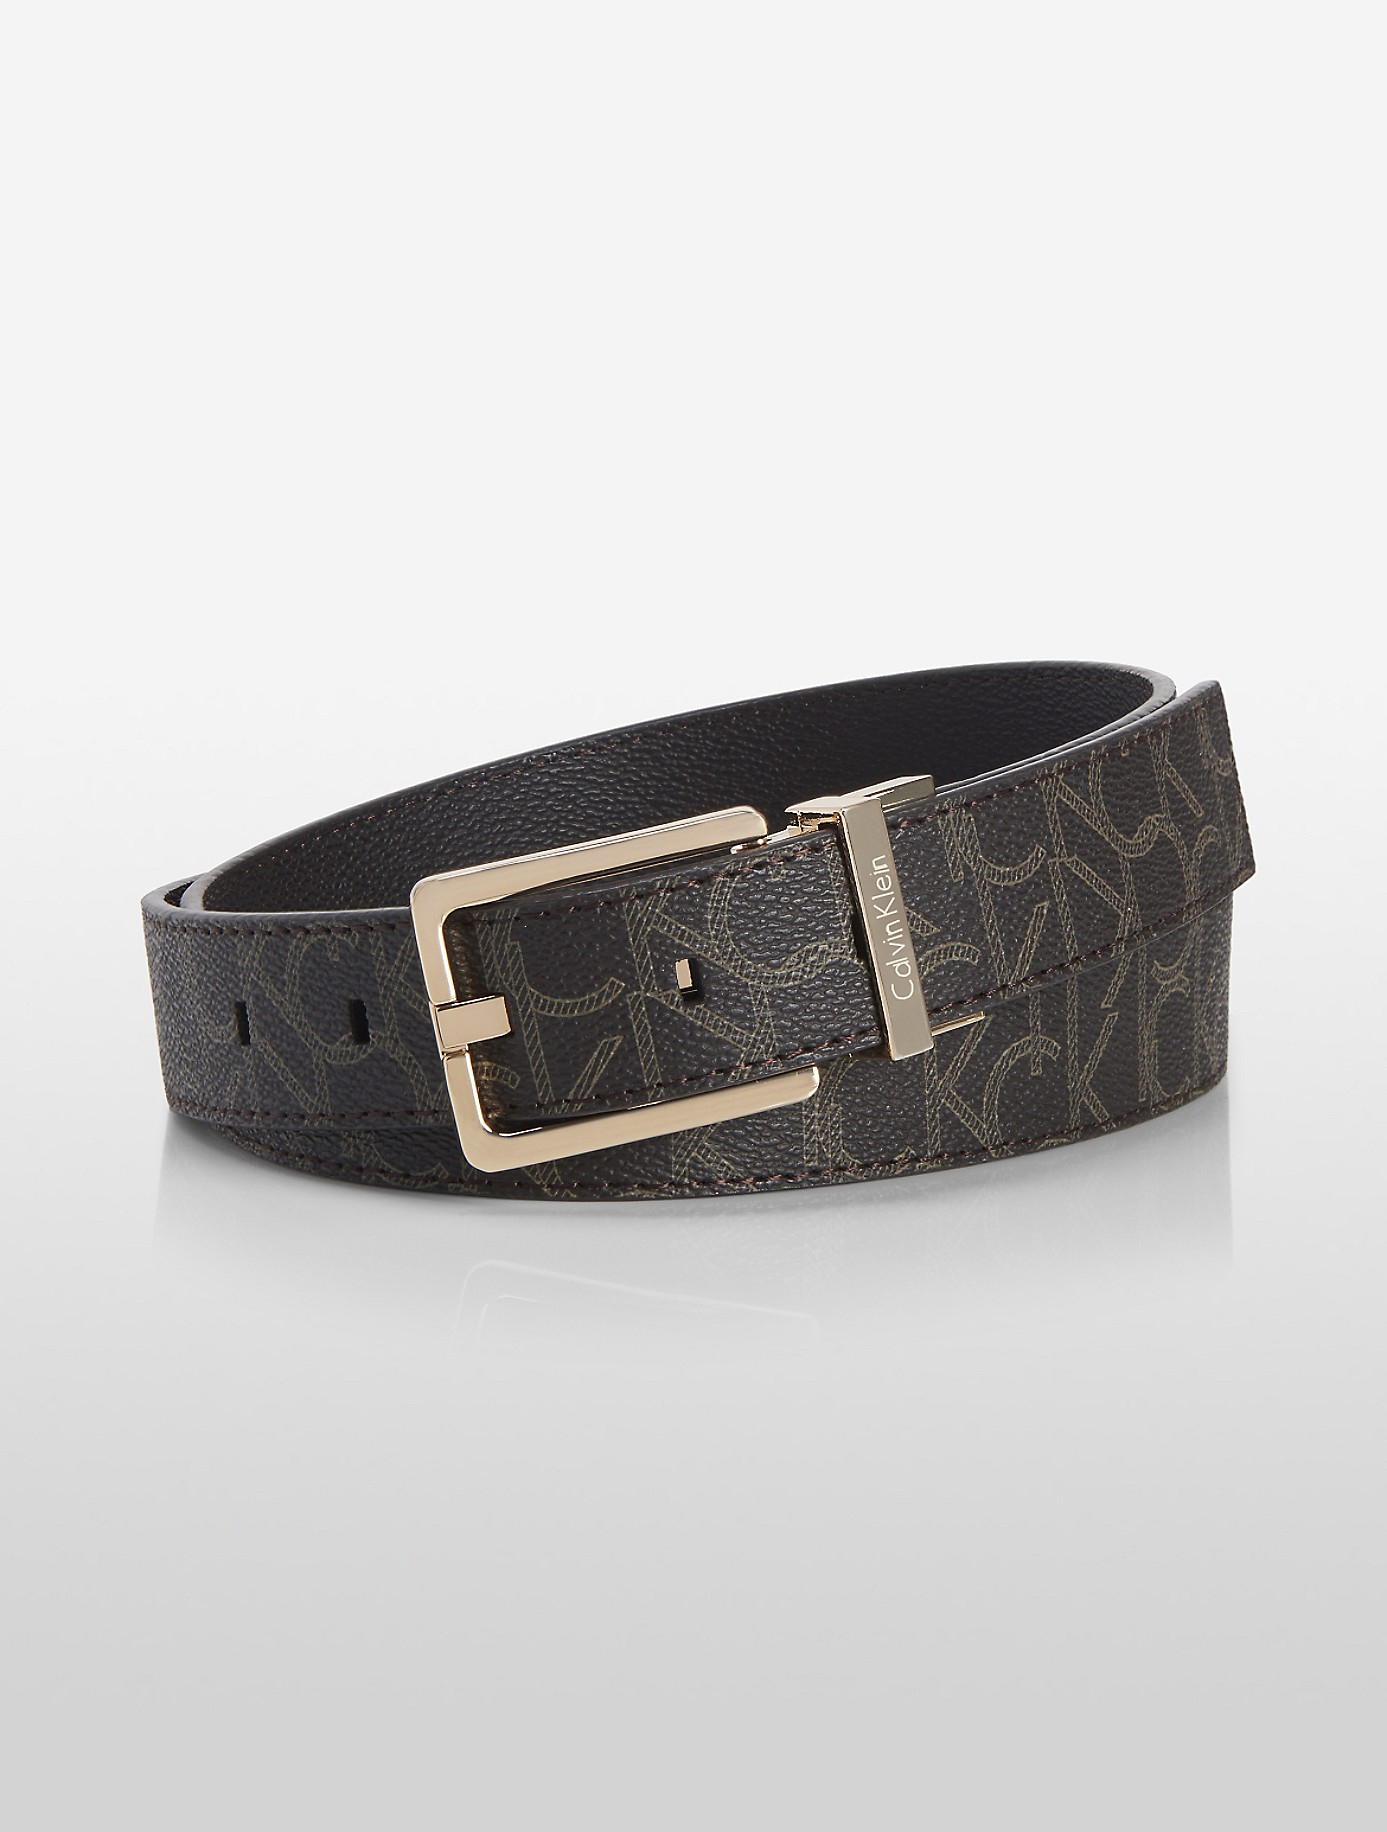 calvin klein white label logo jacquard reversible belt in